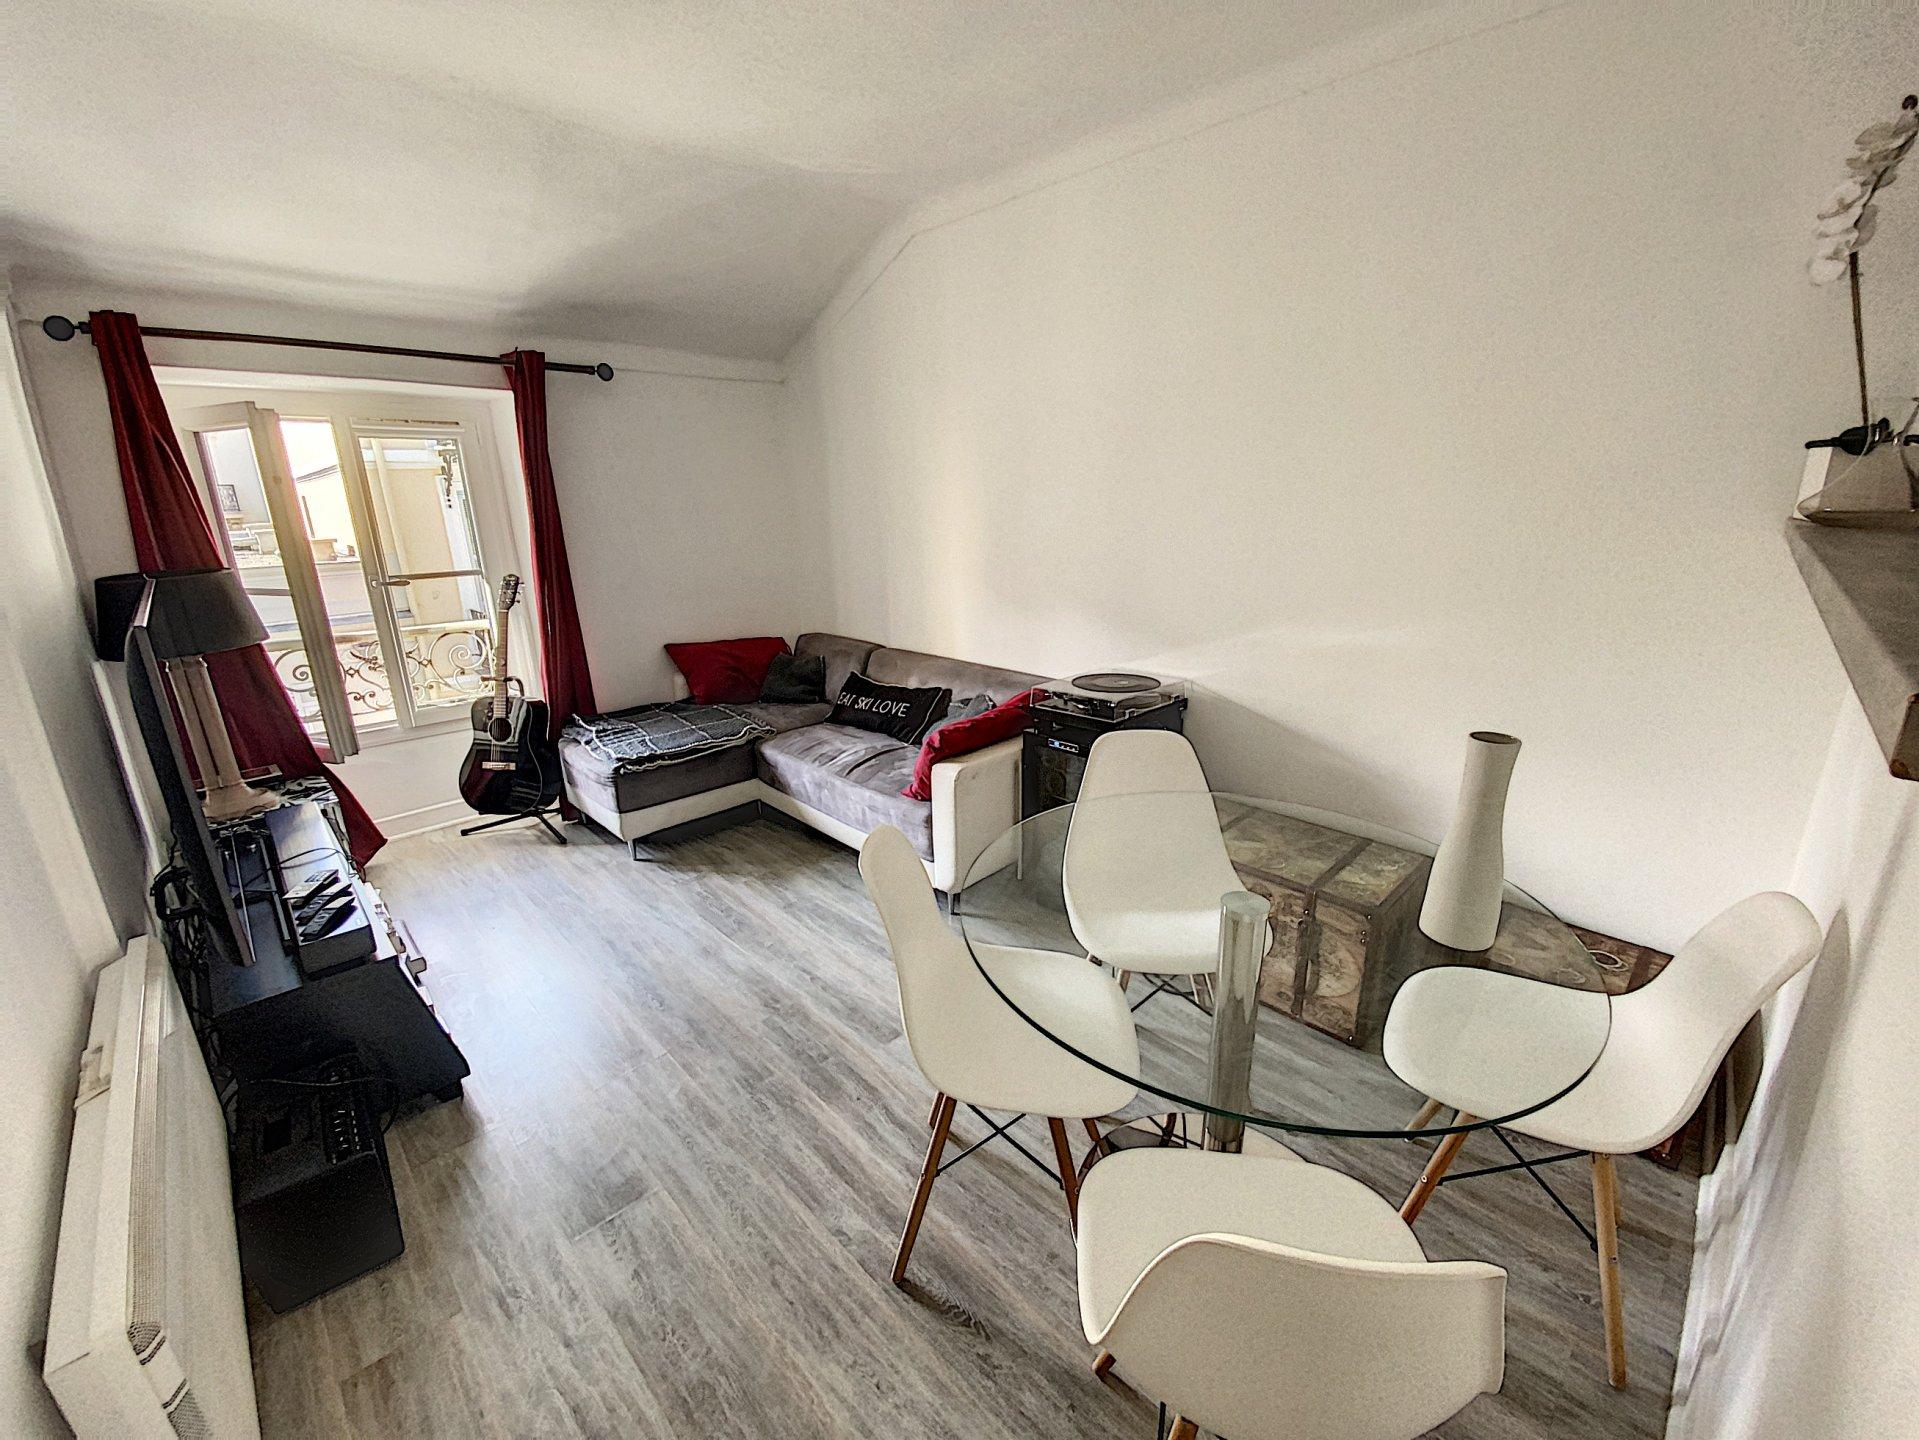 NICE (06000) - Appartement 2/3 pièces - Jean Médecin